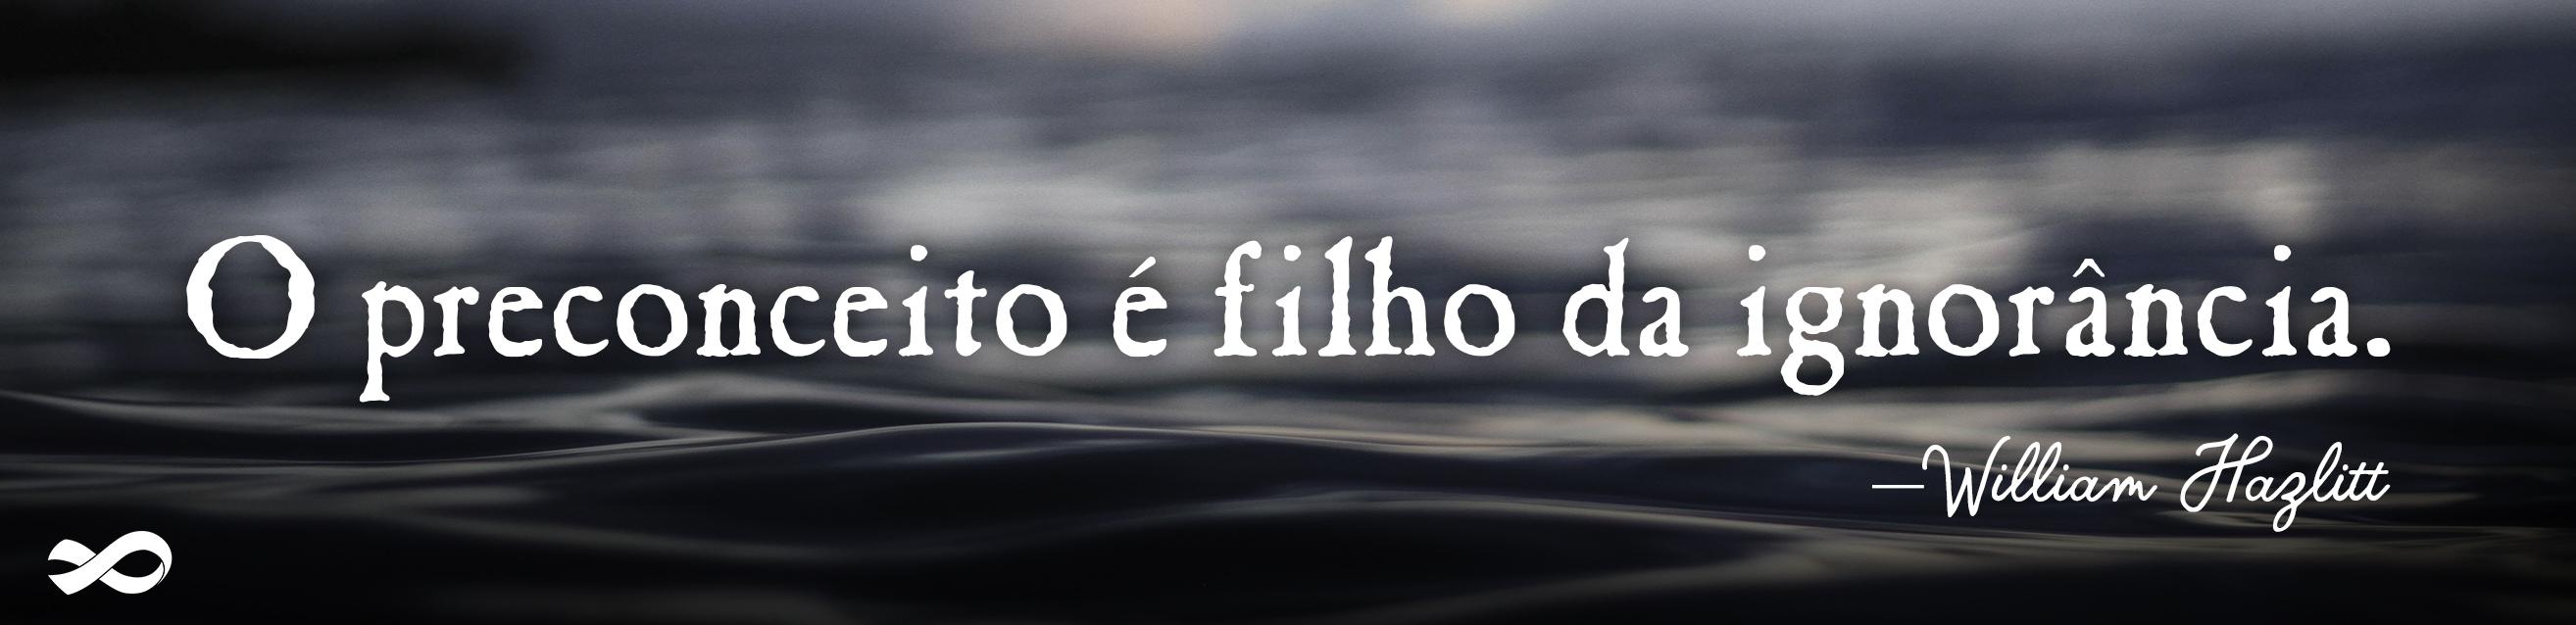 Banner_Janeiro2